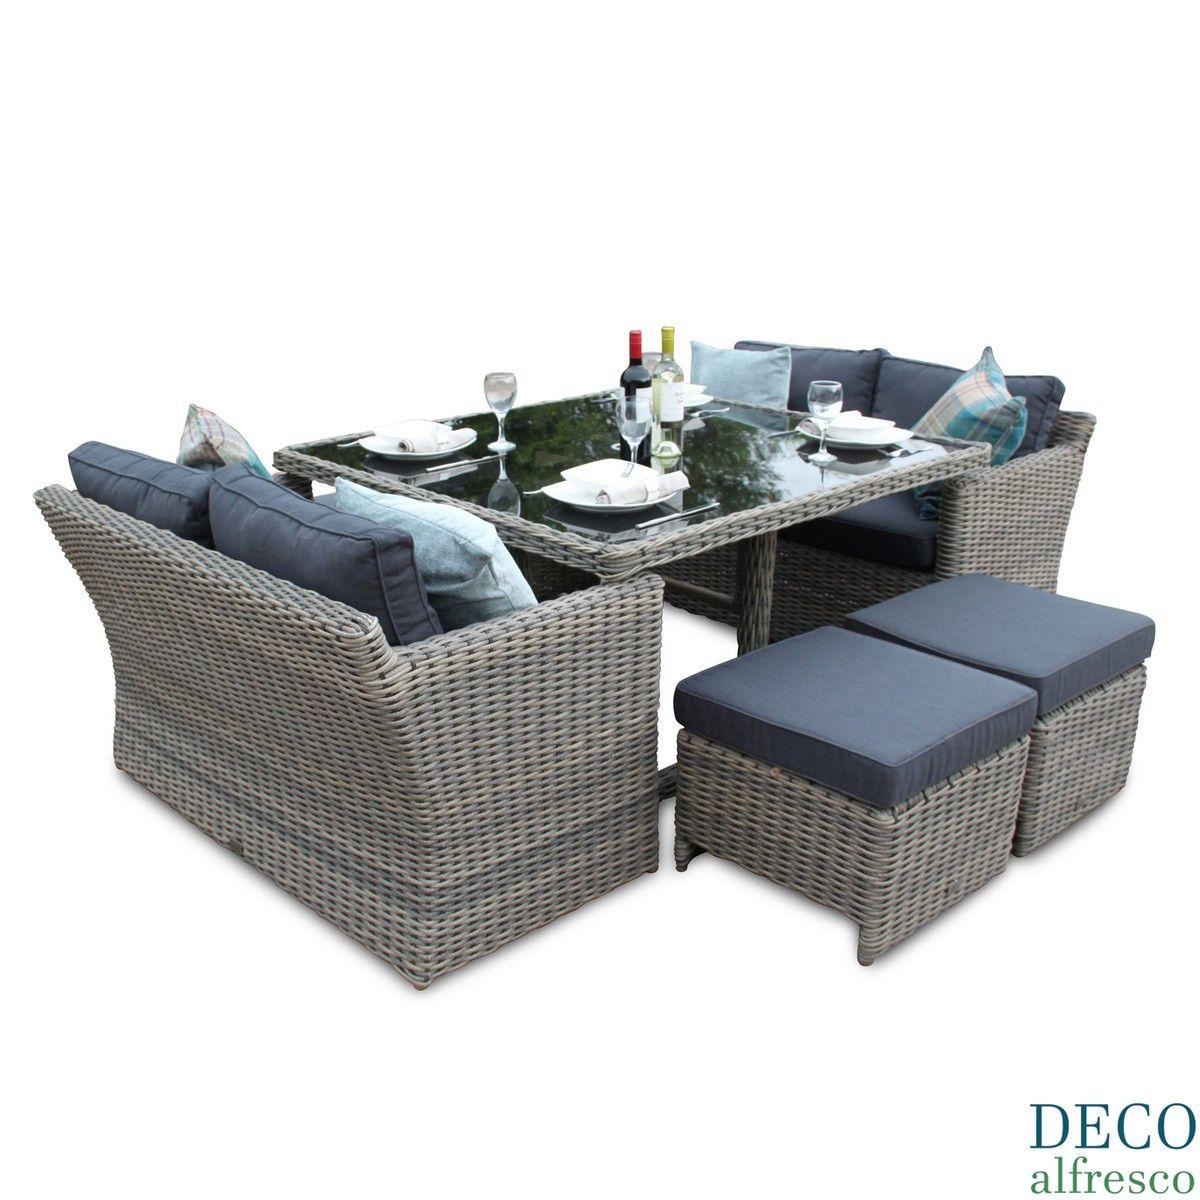 8PC High Back Sofa Cube Rattan Furniture Set - Natural Tri-weave | 3 ...